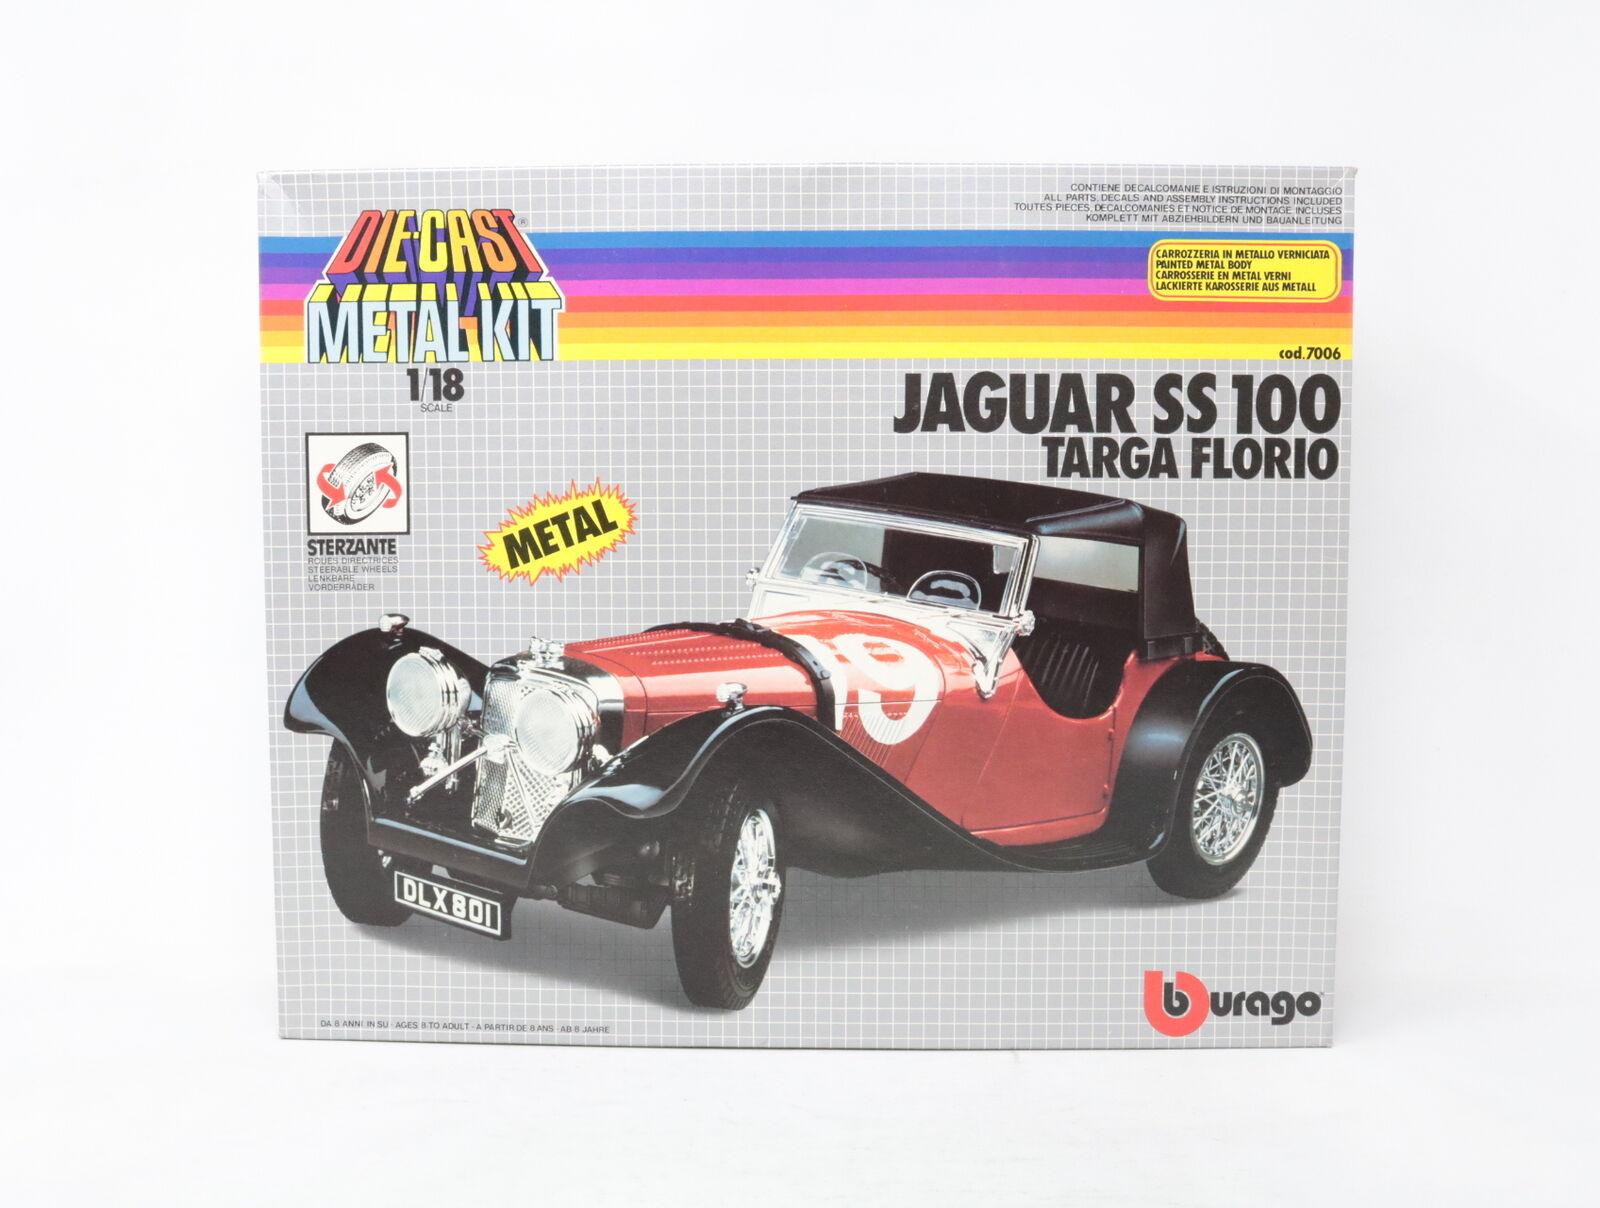 1 18 BBURAGO METAL KIT JAGUAR SS100 TARGA FLORIO cod. 7006  [YQ018]